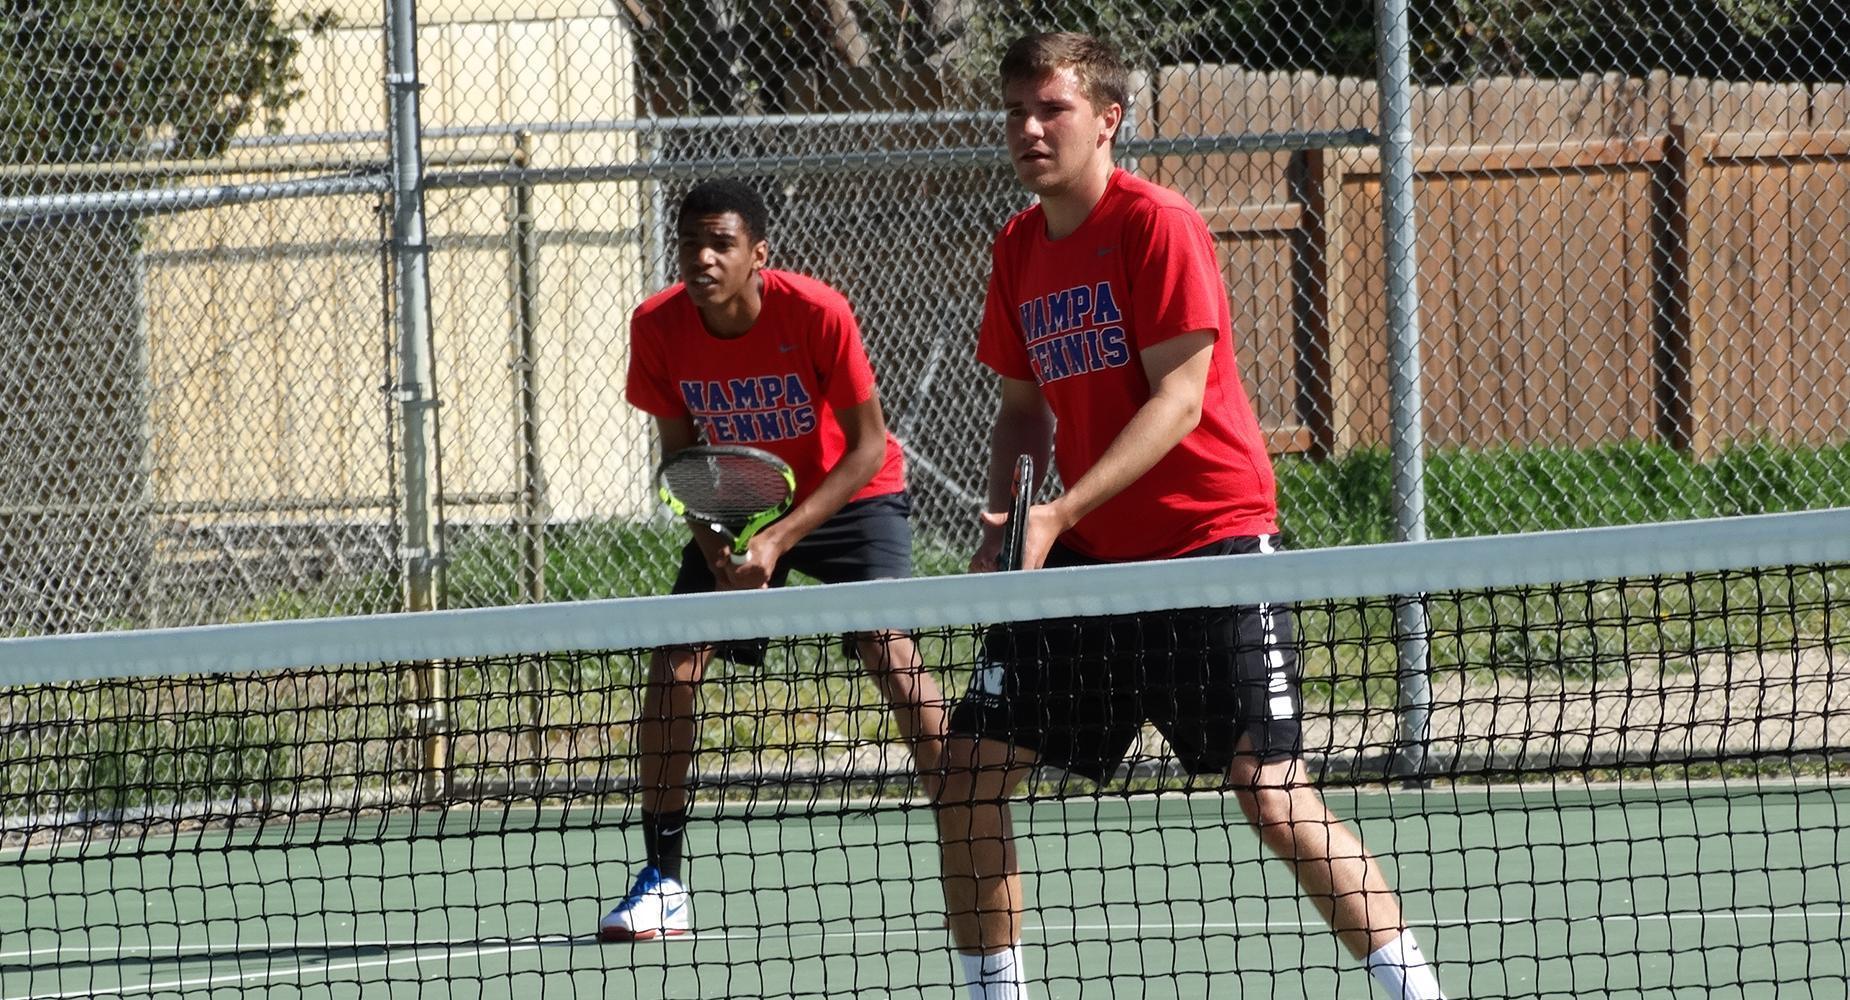 NHS Tennis Players